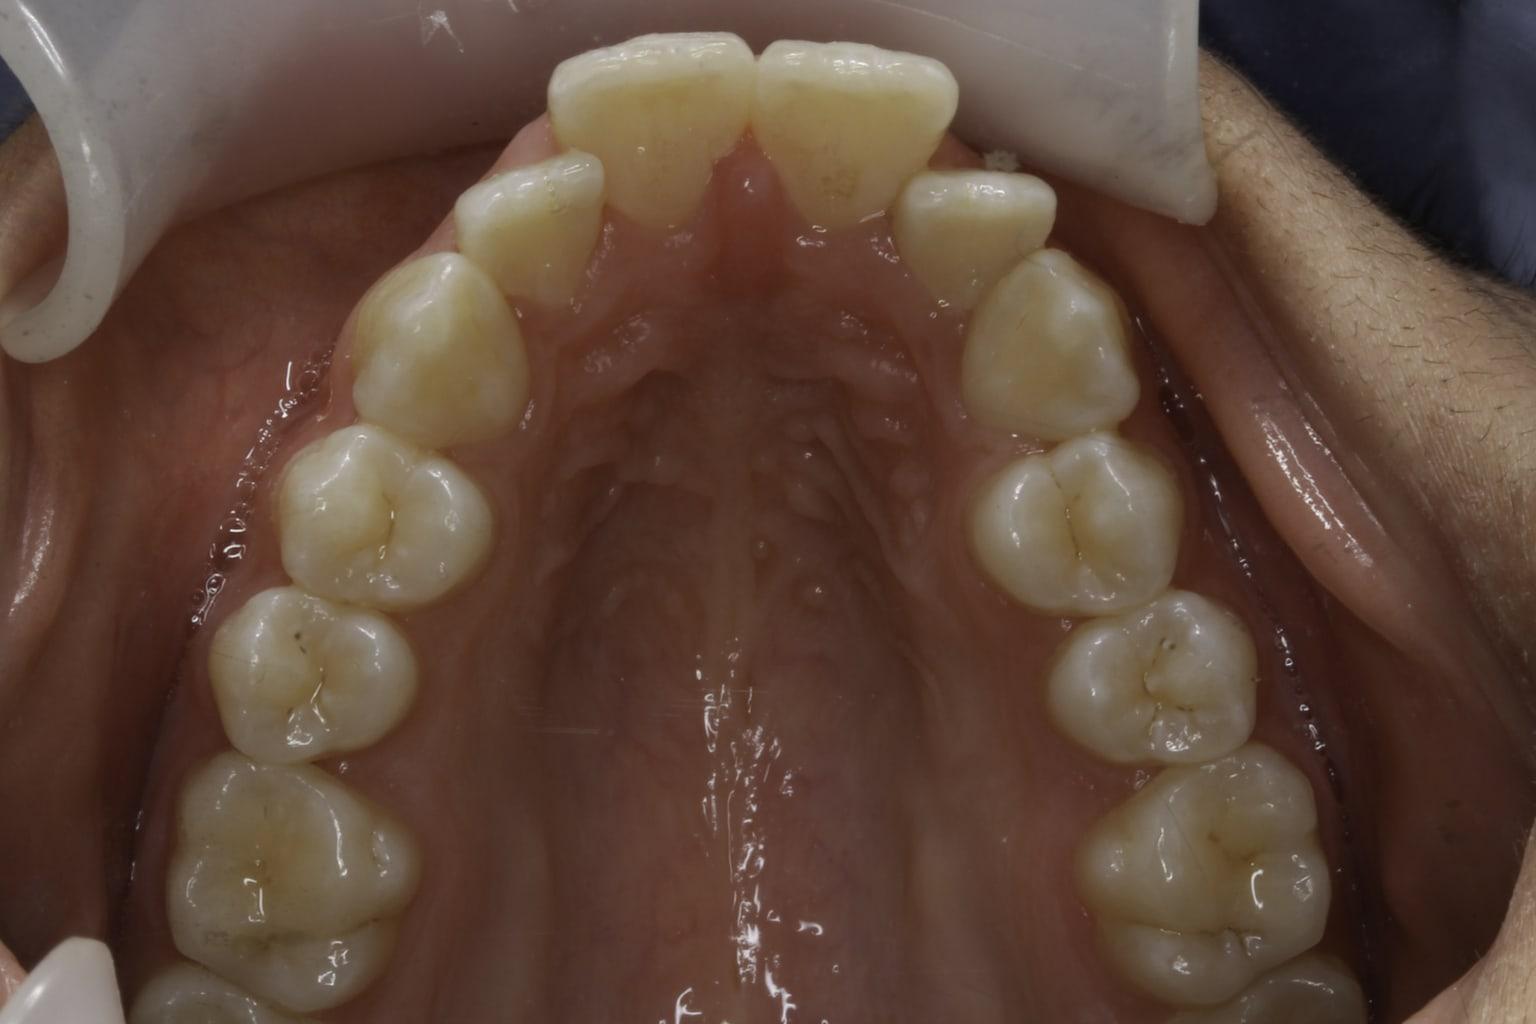 imbalance teeth 4 before